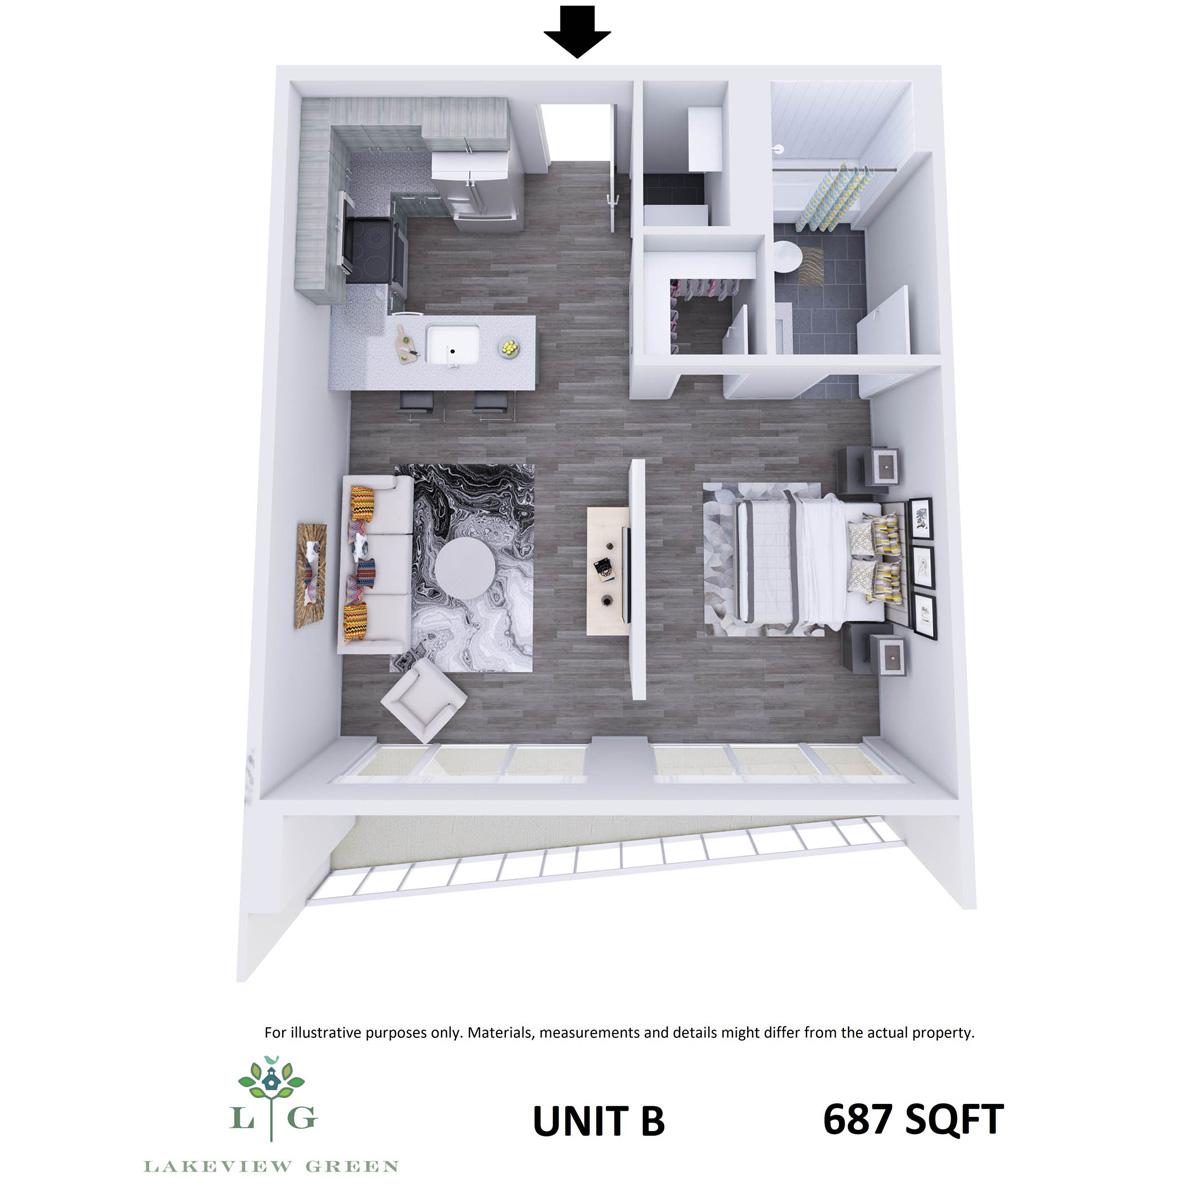 1-Bedroom Apartment (End Unit)